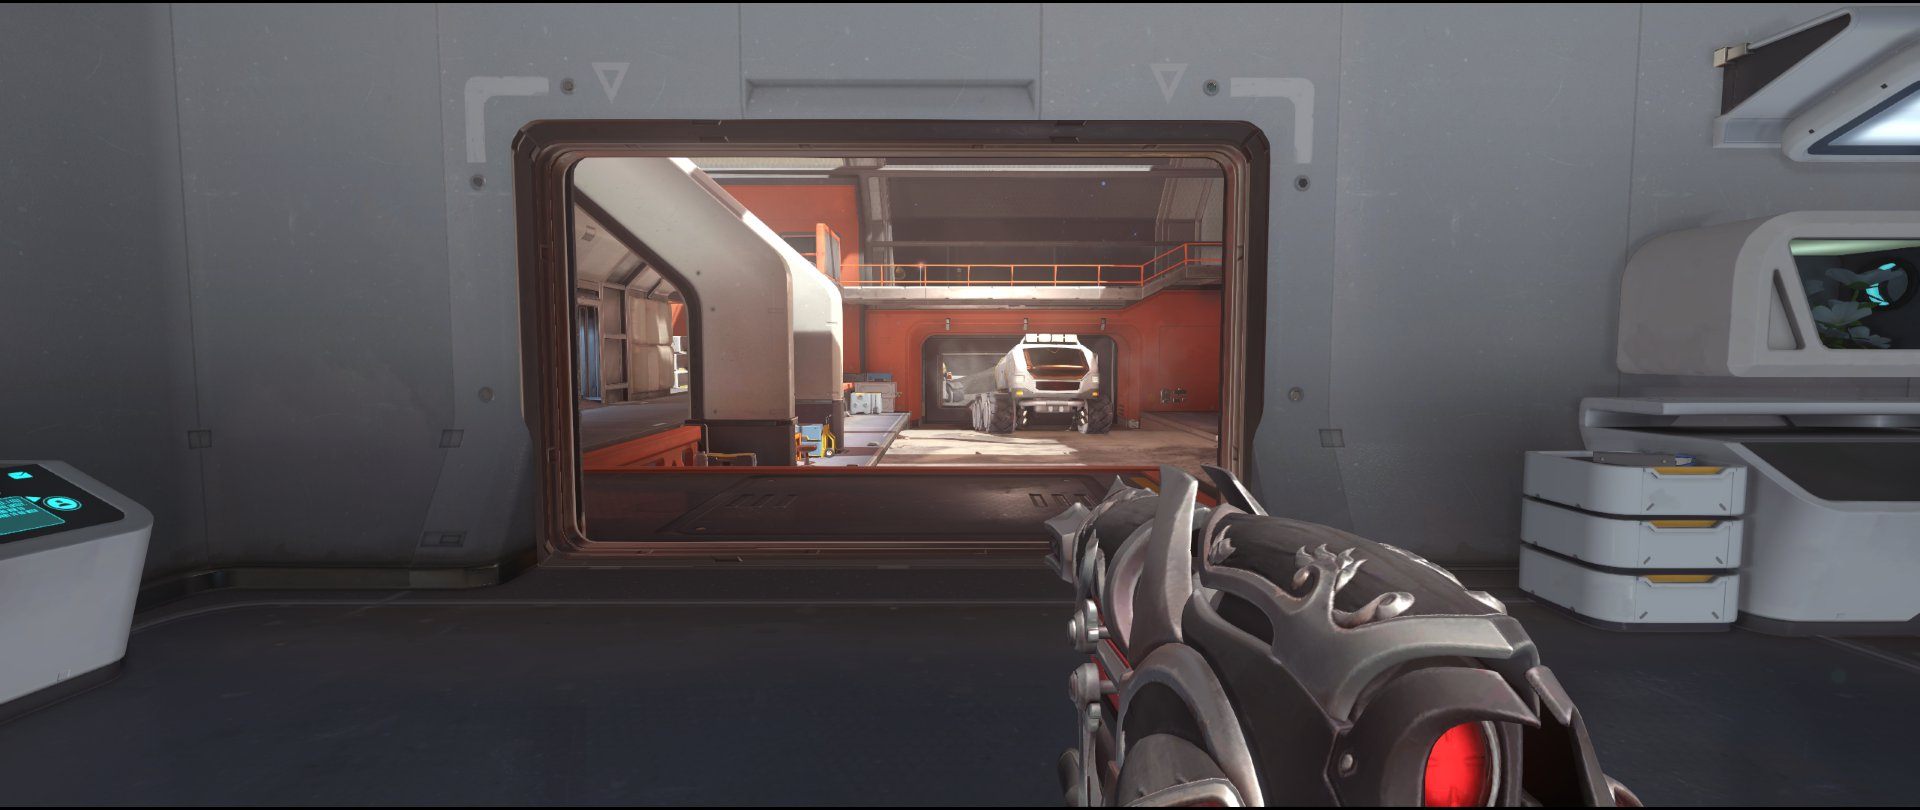 Earth+view+attack+sniping+spot+Widowmaker+Horizon+Lunar+Colony+Overwatch